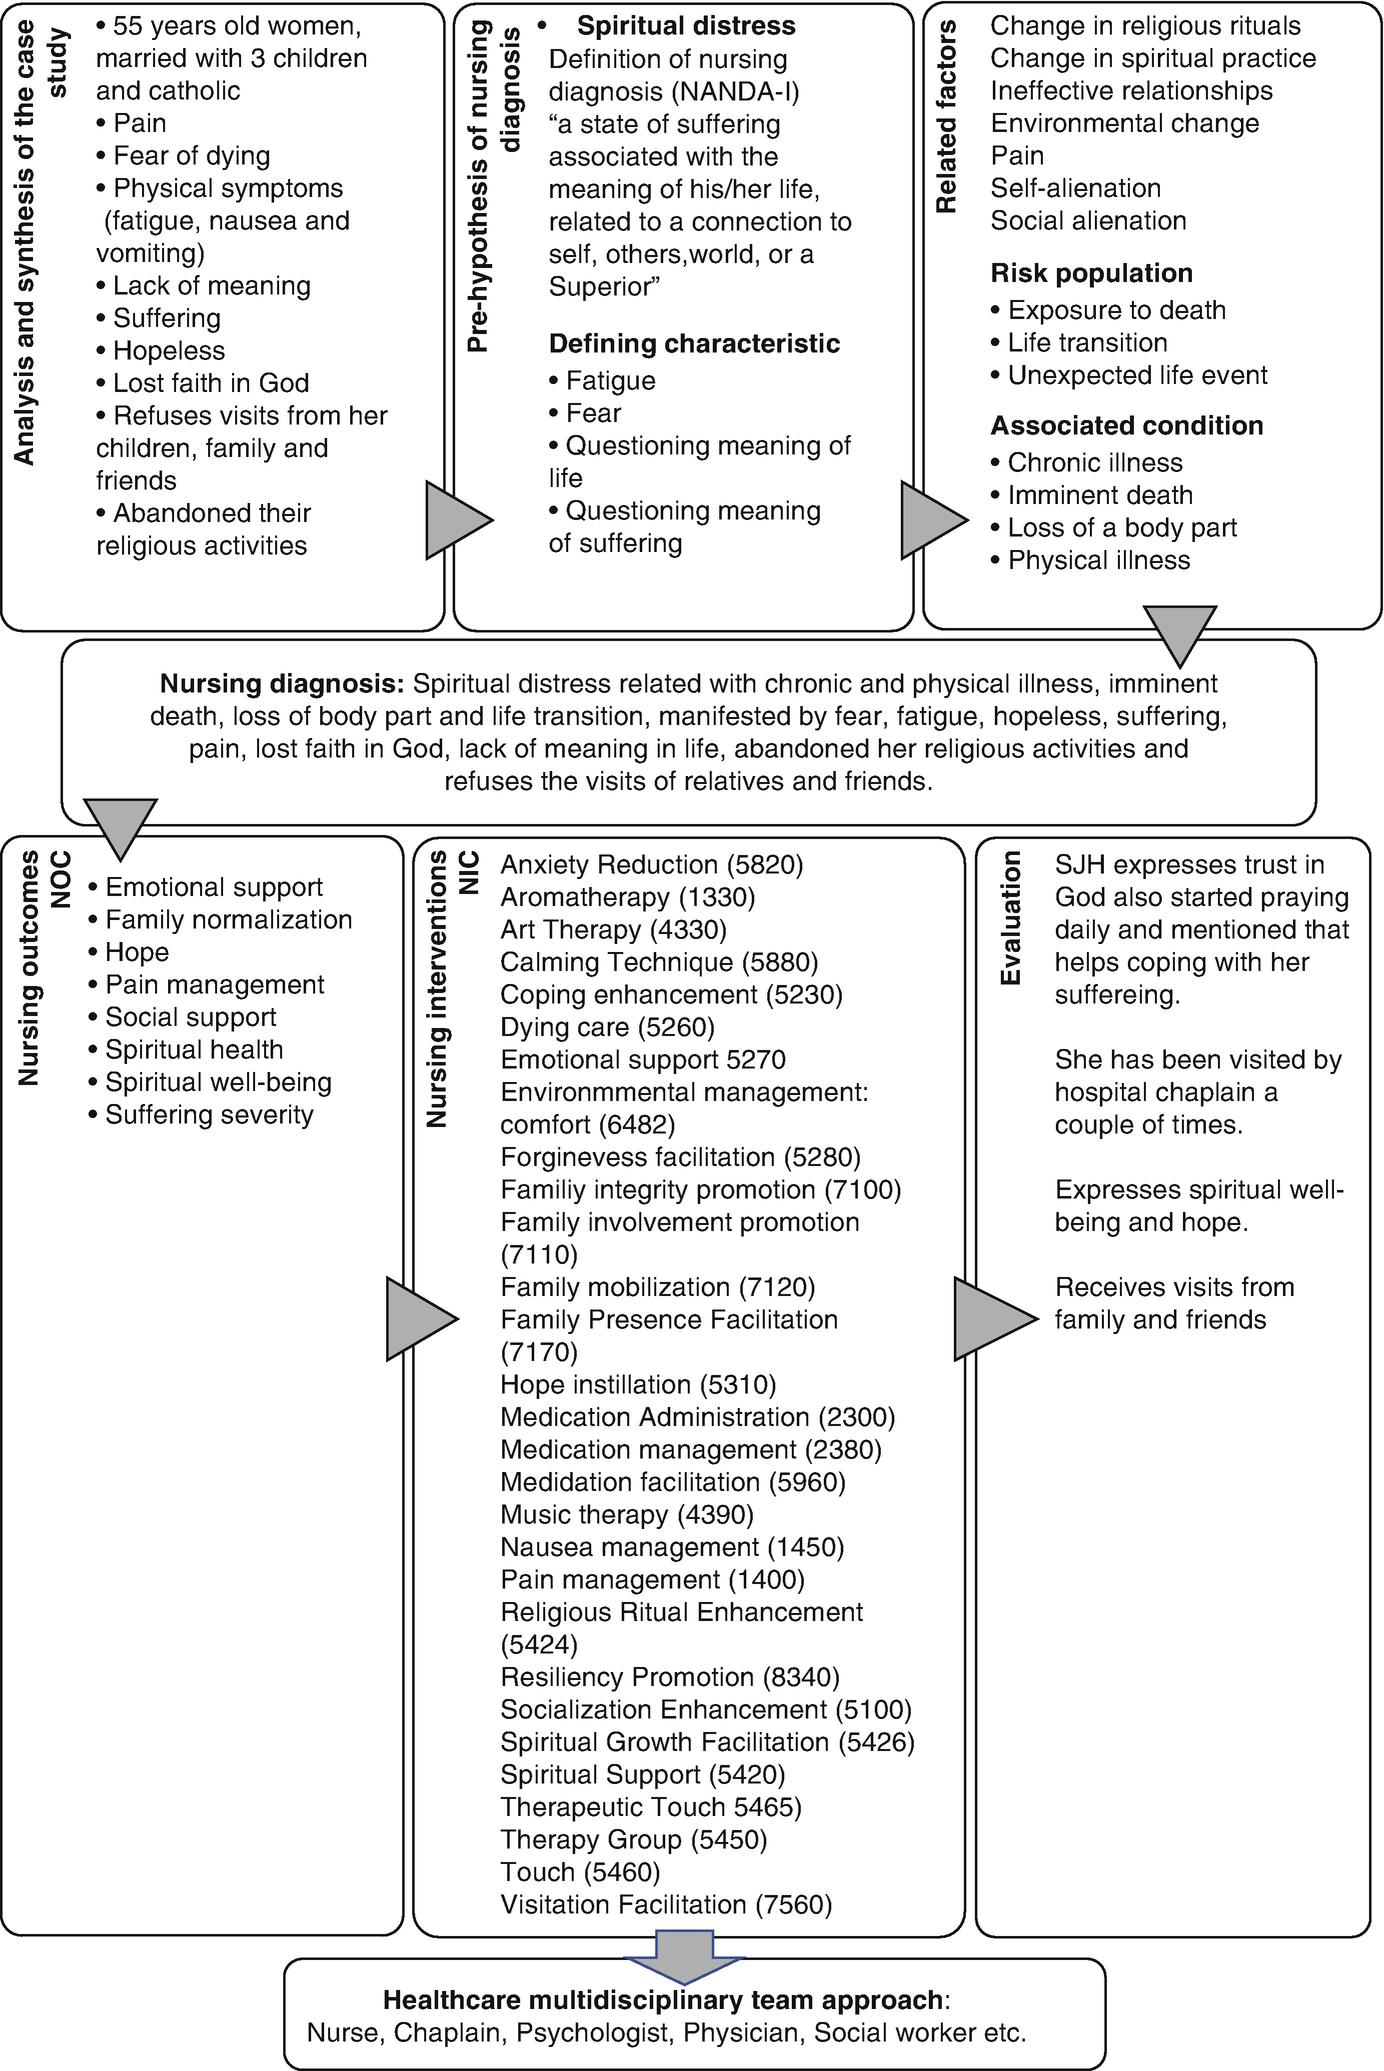 The Role of the Nurse in Providing Spiritual Care: A Case Study